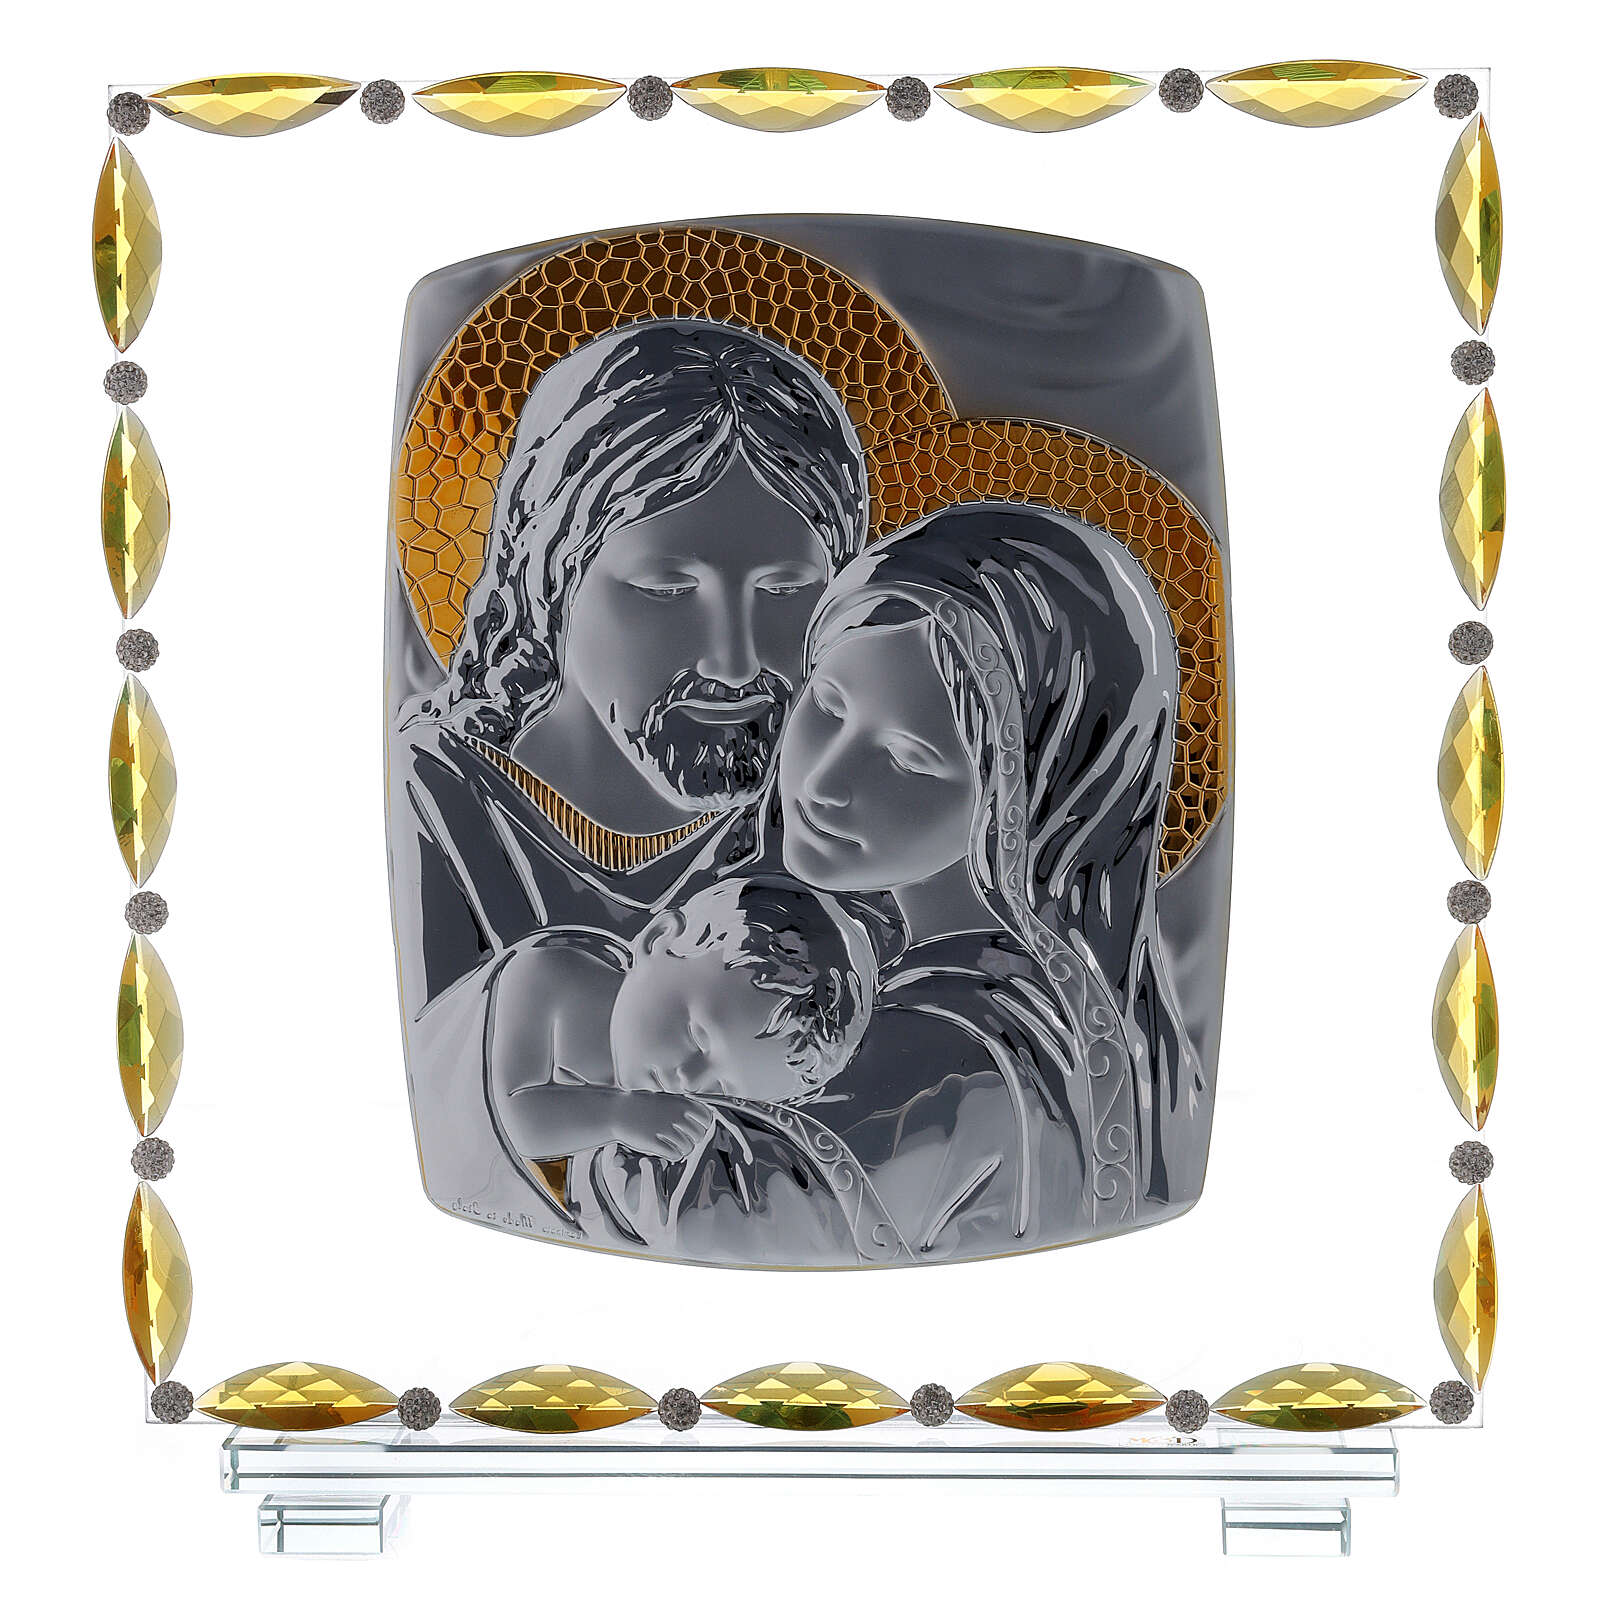 Cuadro Sagrada Familia vidrio y cristal 3